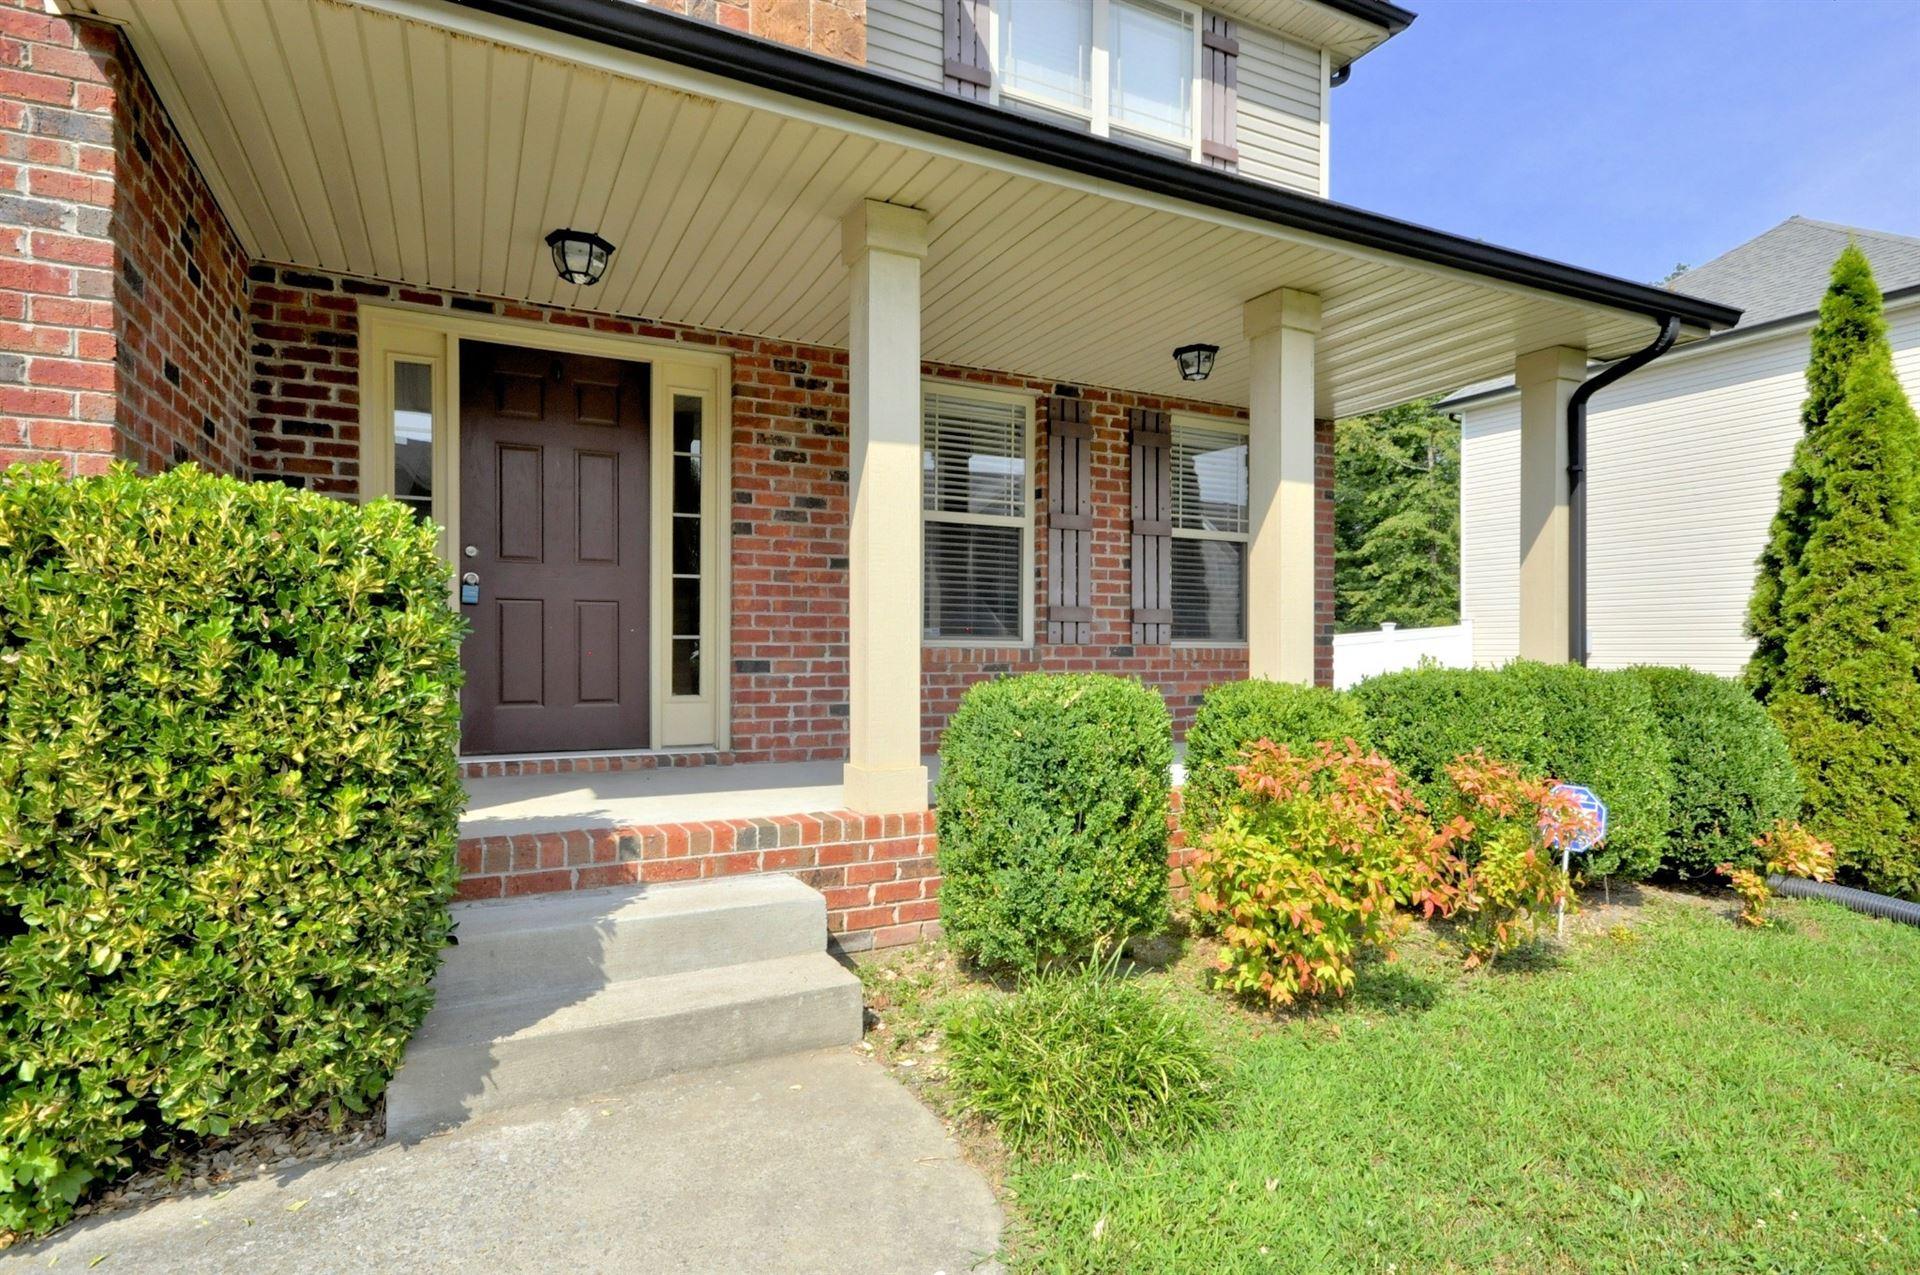 578 Press Grove Dr, Clarksville, TN 37043 - MLS#: 2299932